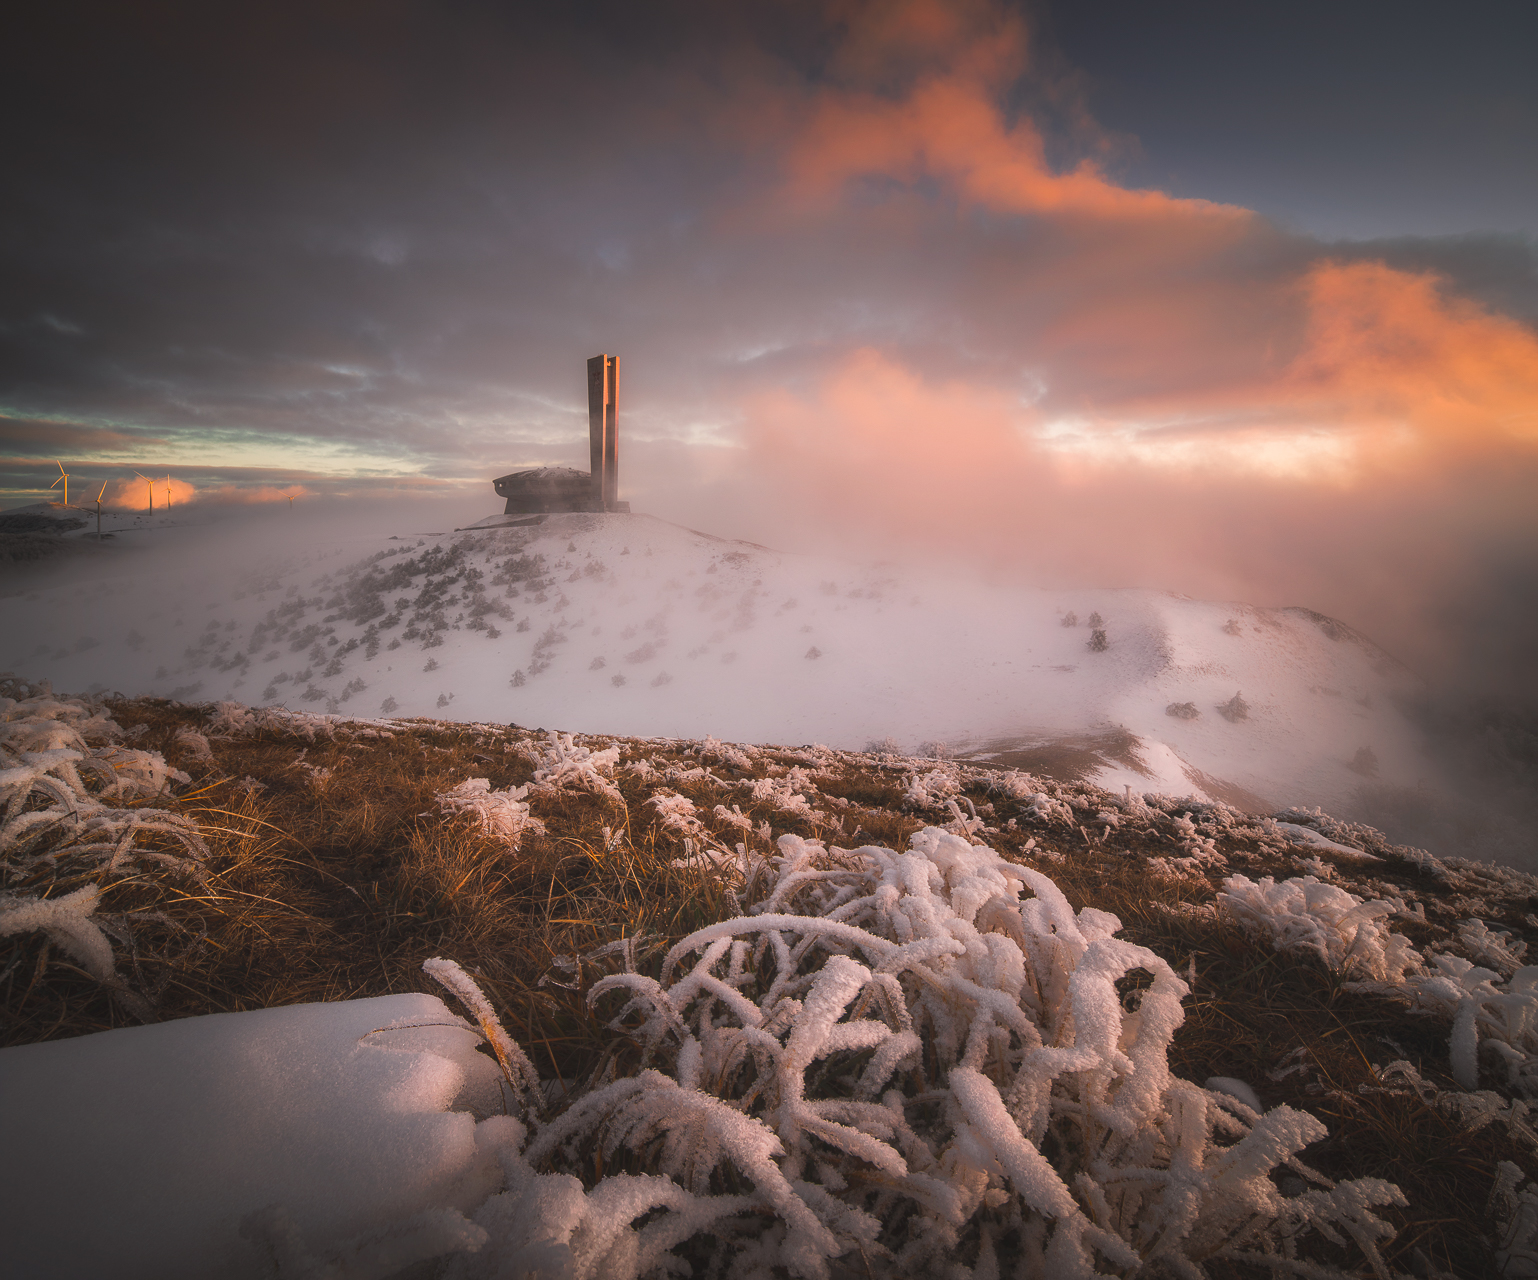 Замръзнали във времето | Author strballer | PHOTO FORUM